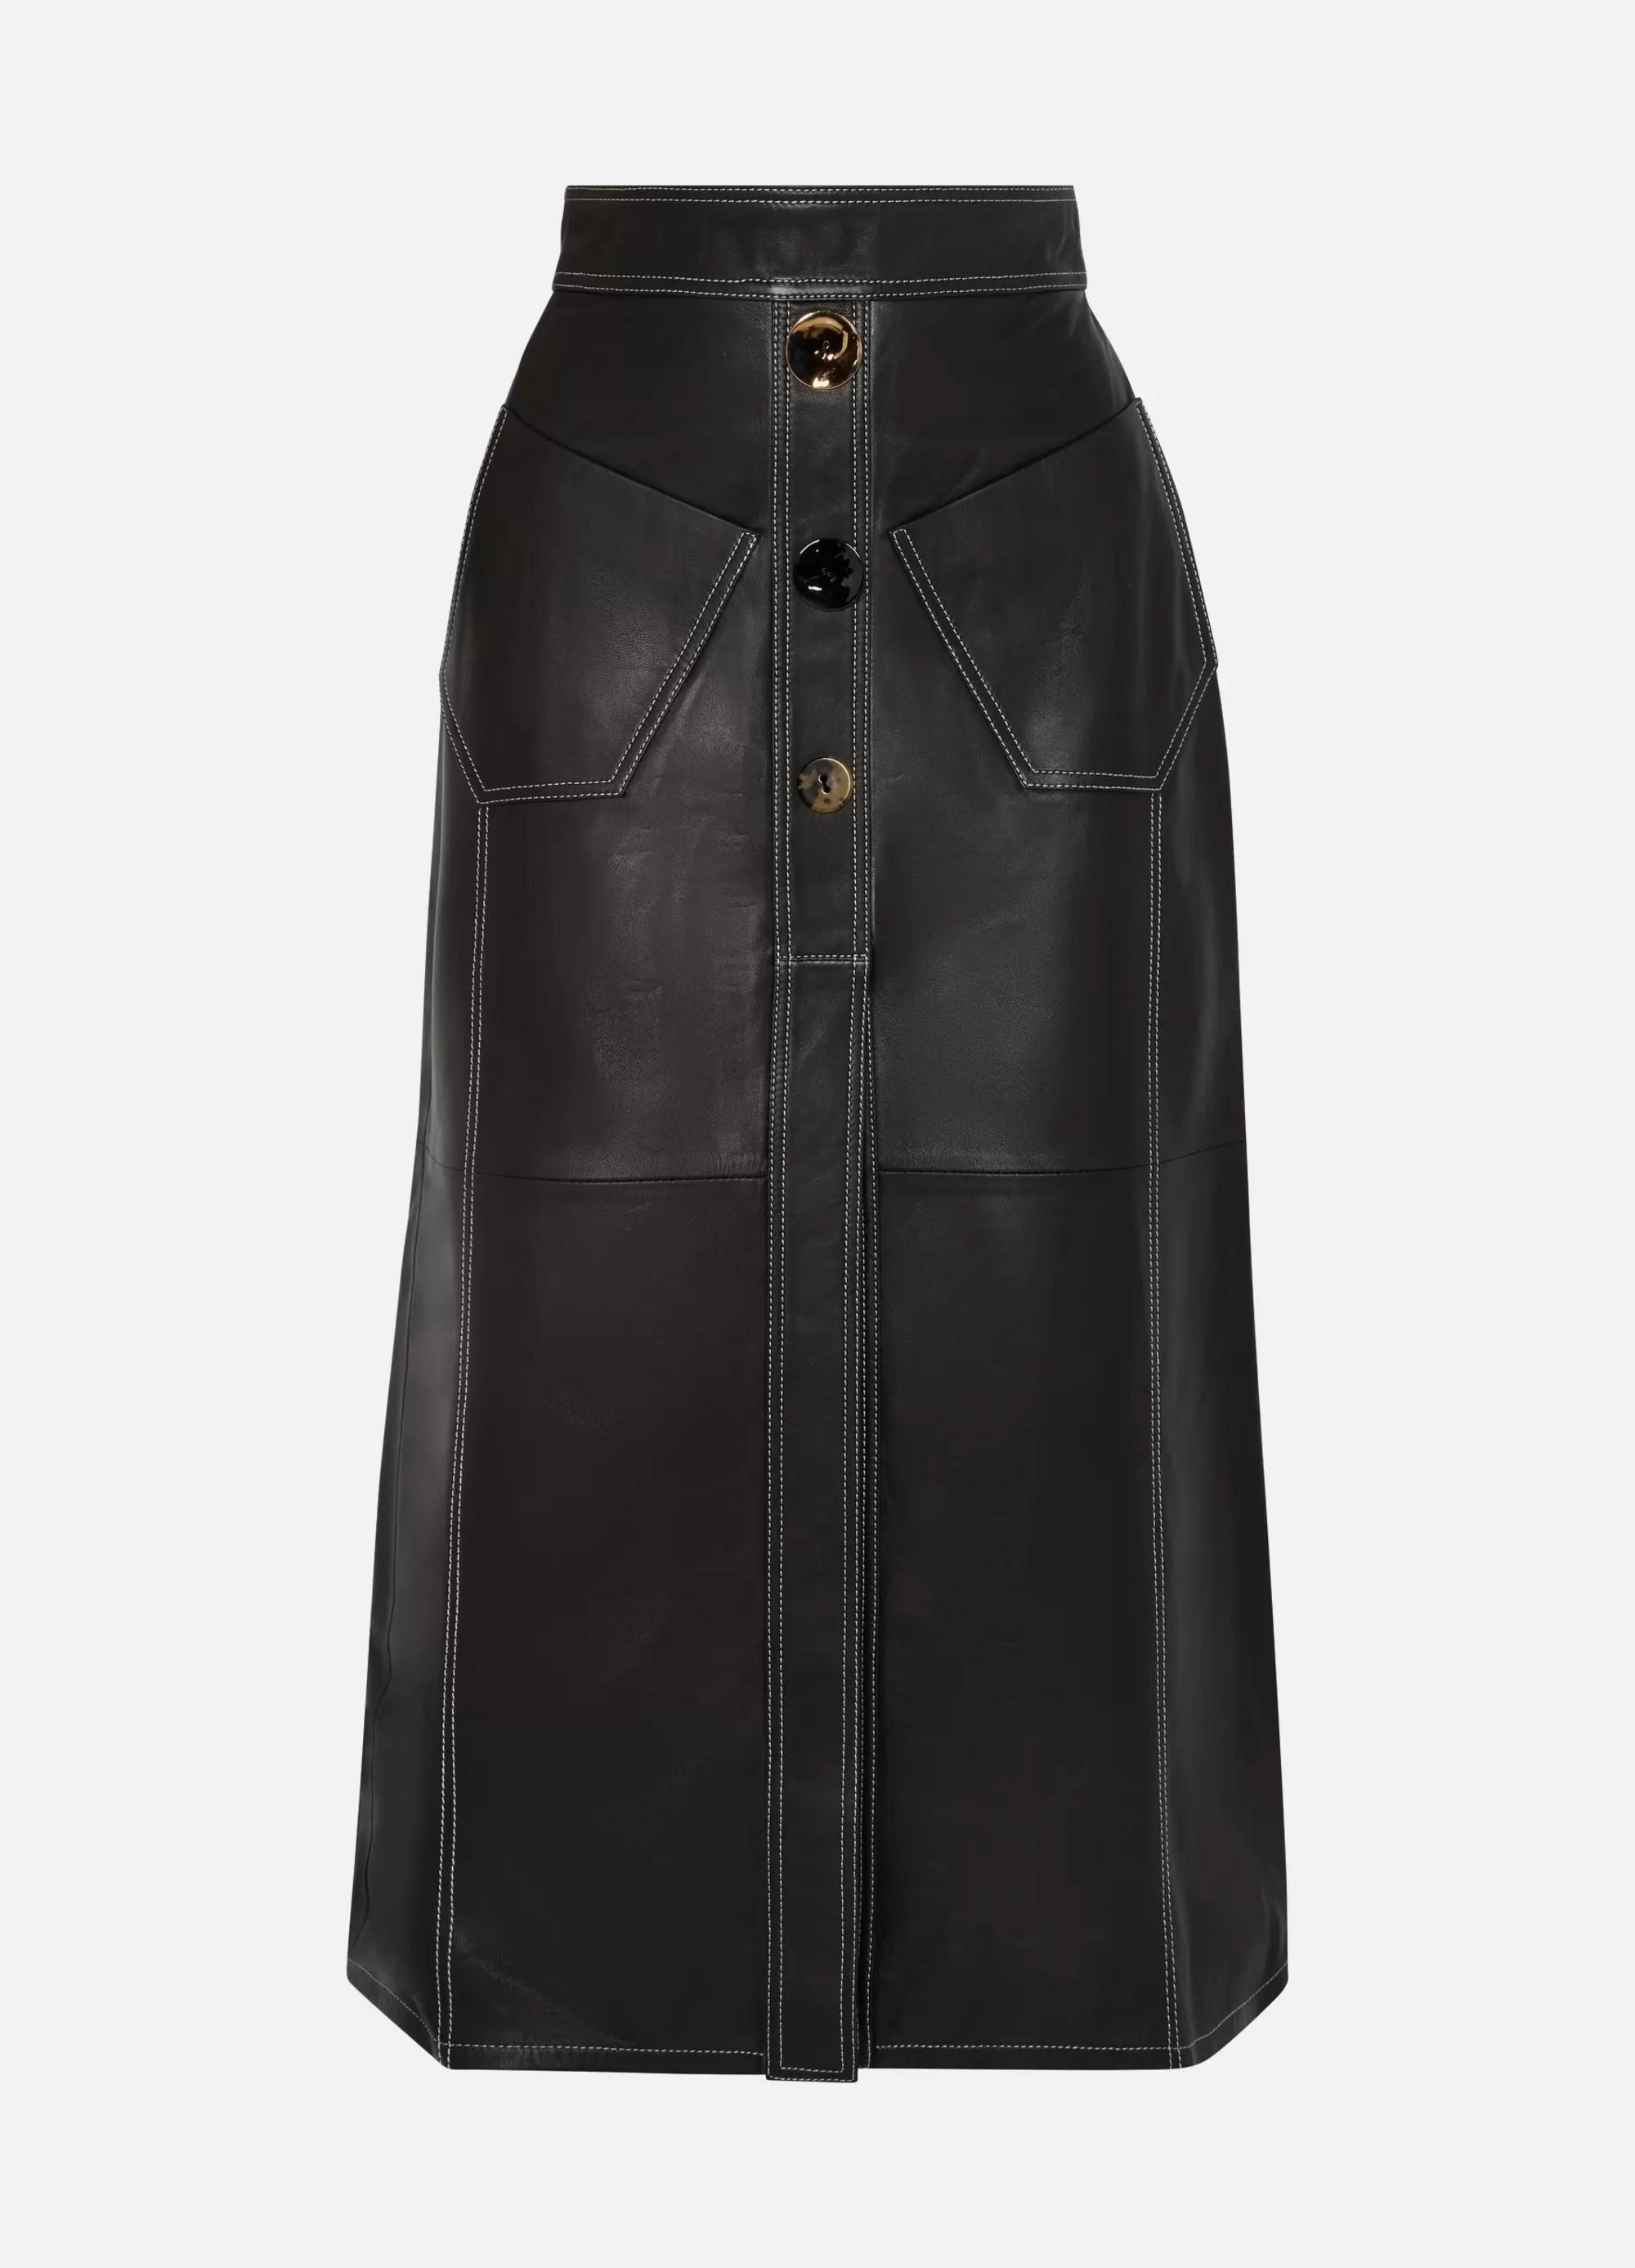 Ellery Aggie embellished leather midi skirt